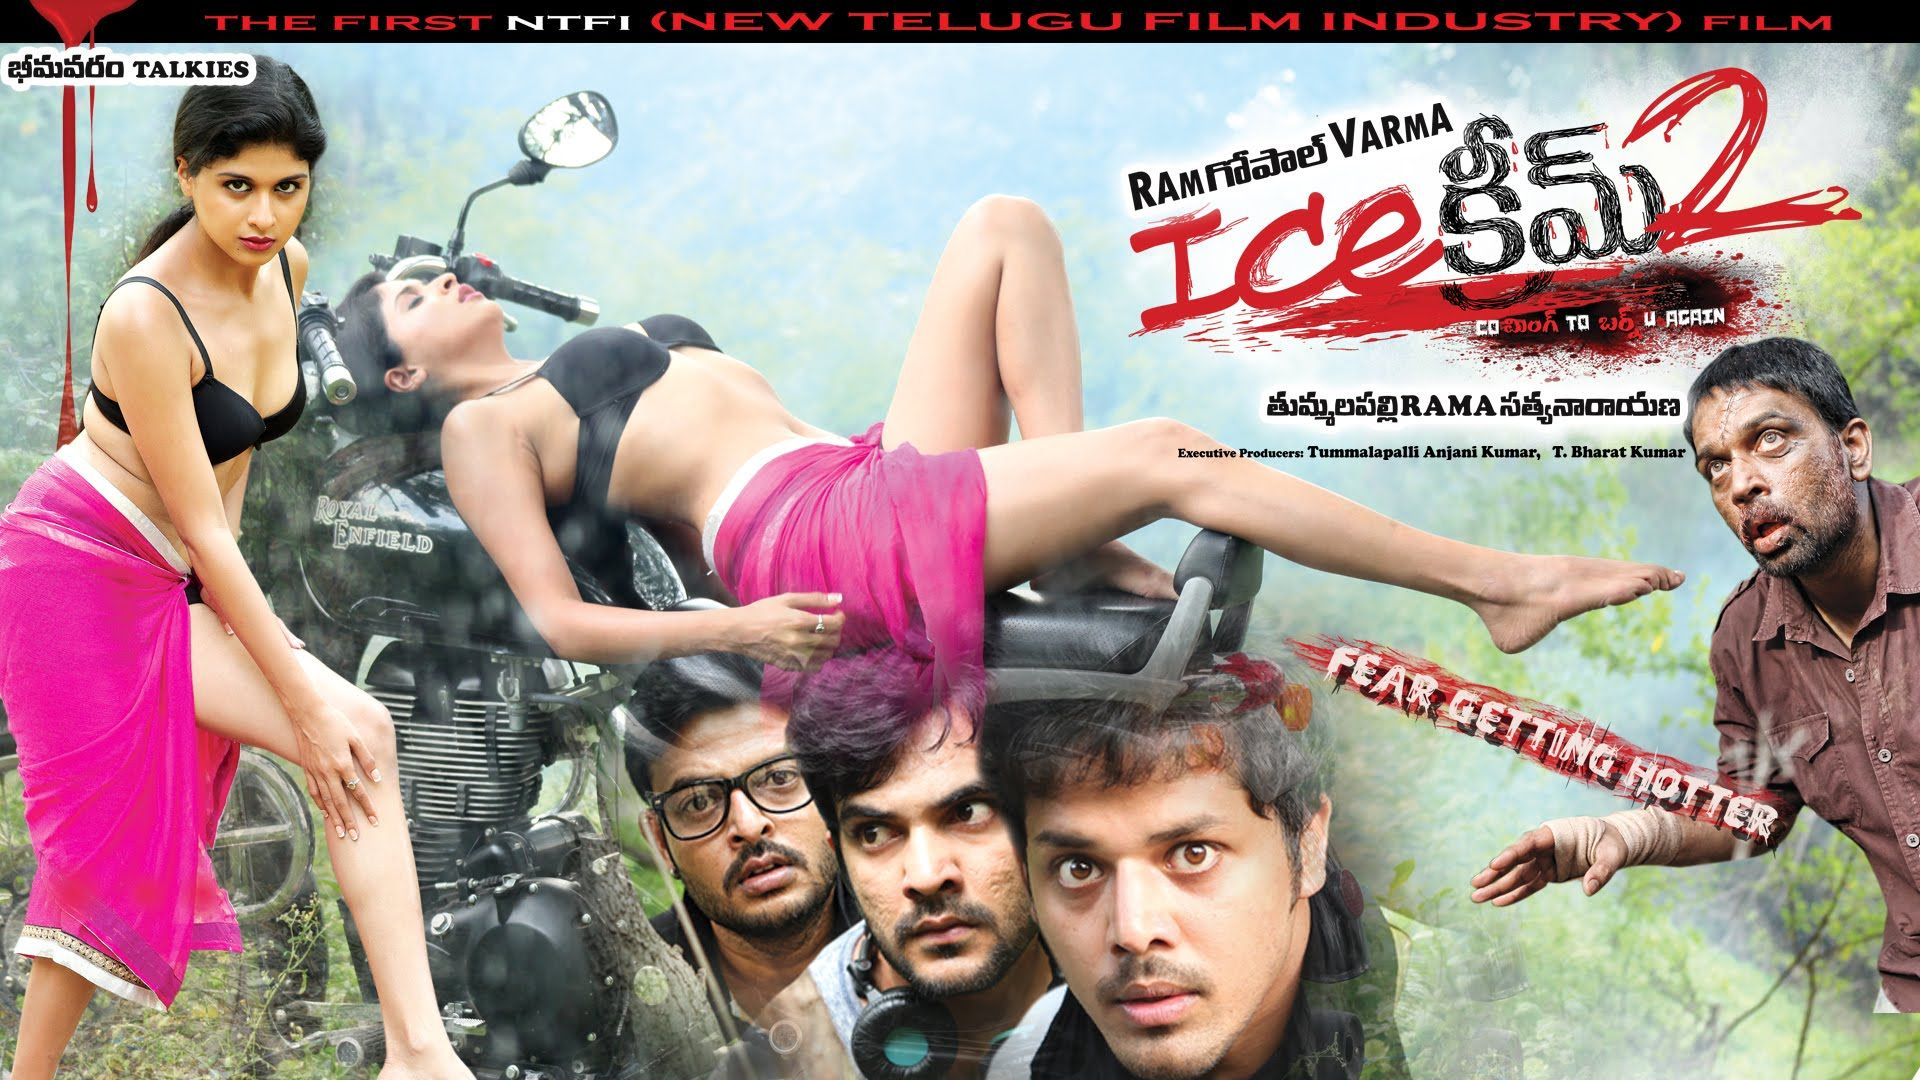 Hindi 2.0 – Telugu 5.1.Jil Video Songs Hd 1080p Blu Ray Telugu Latest 2015  Nollywood urlin.us/5s6ks the jungle book 1080p tpb proxy windows movie  maker ...